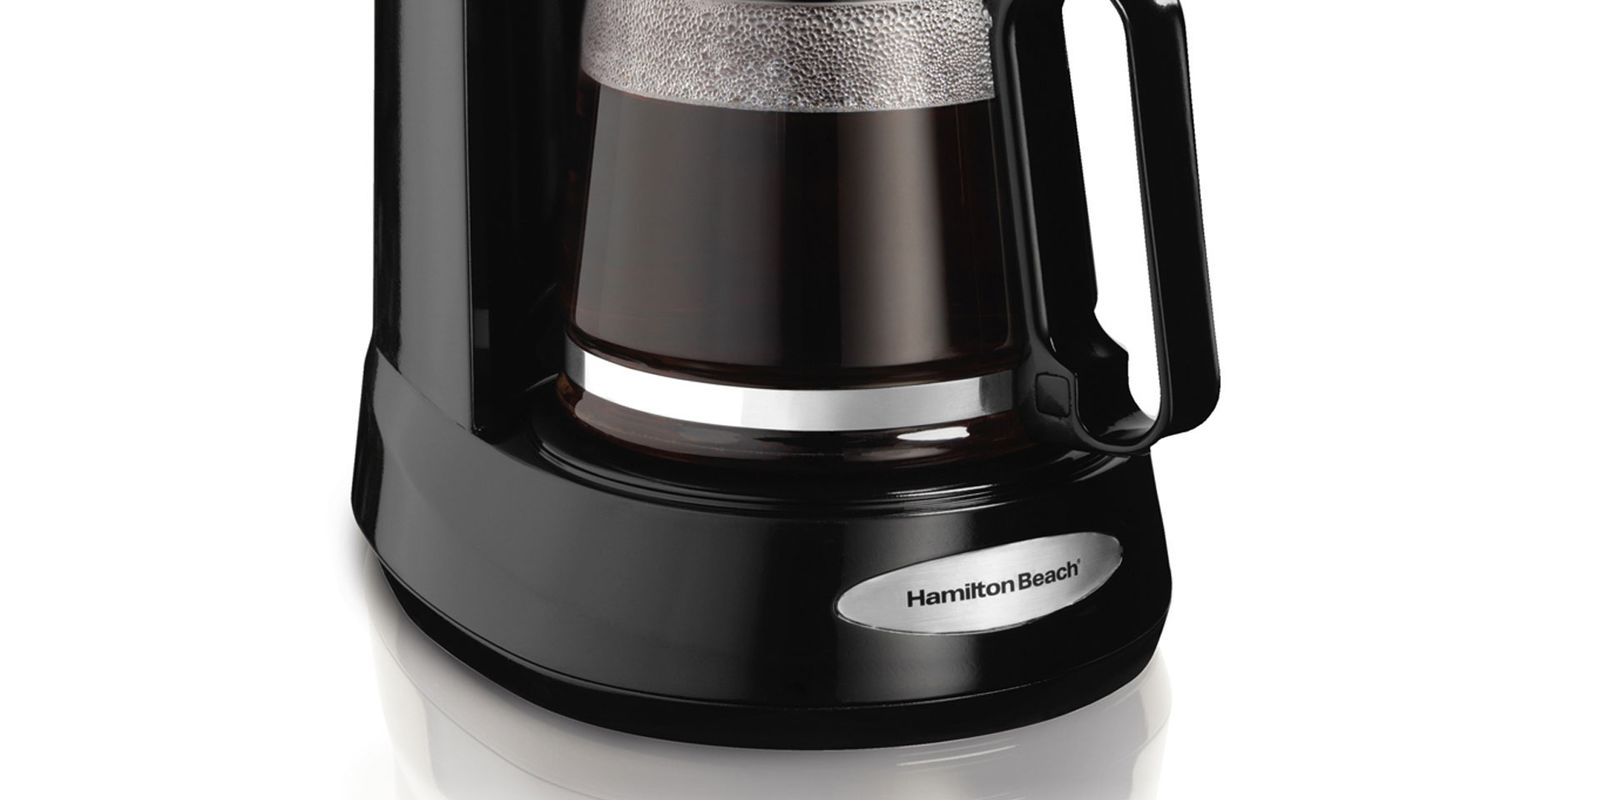 Hamilton Beach 5-Cup Coffee Maker #48136 Review